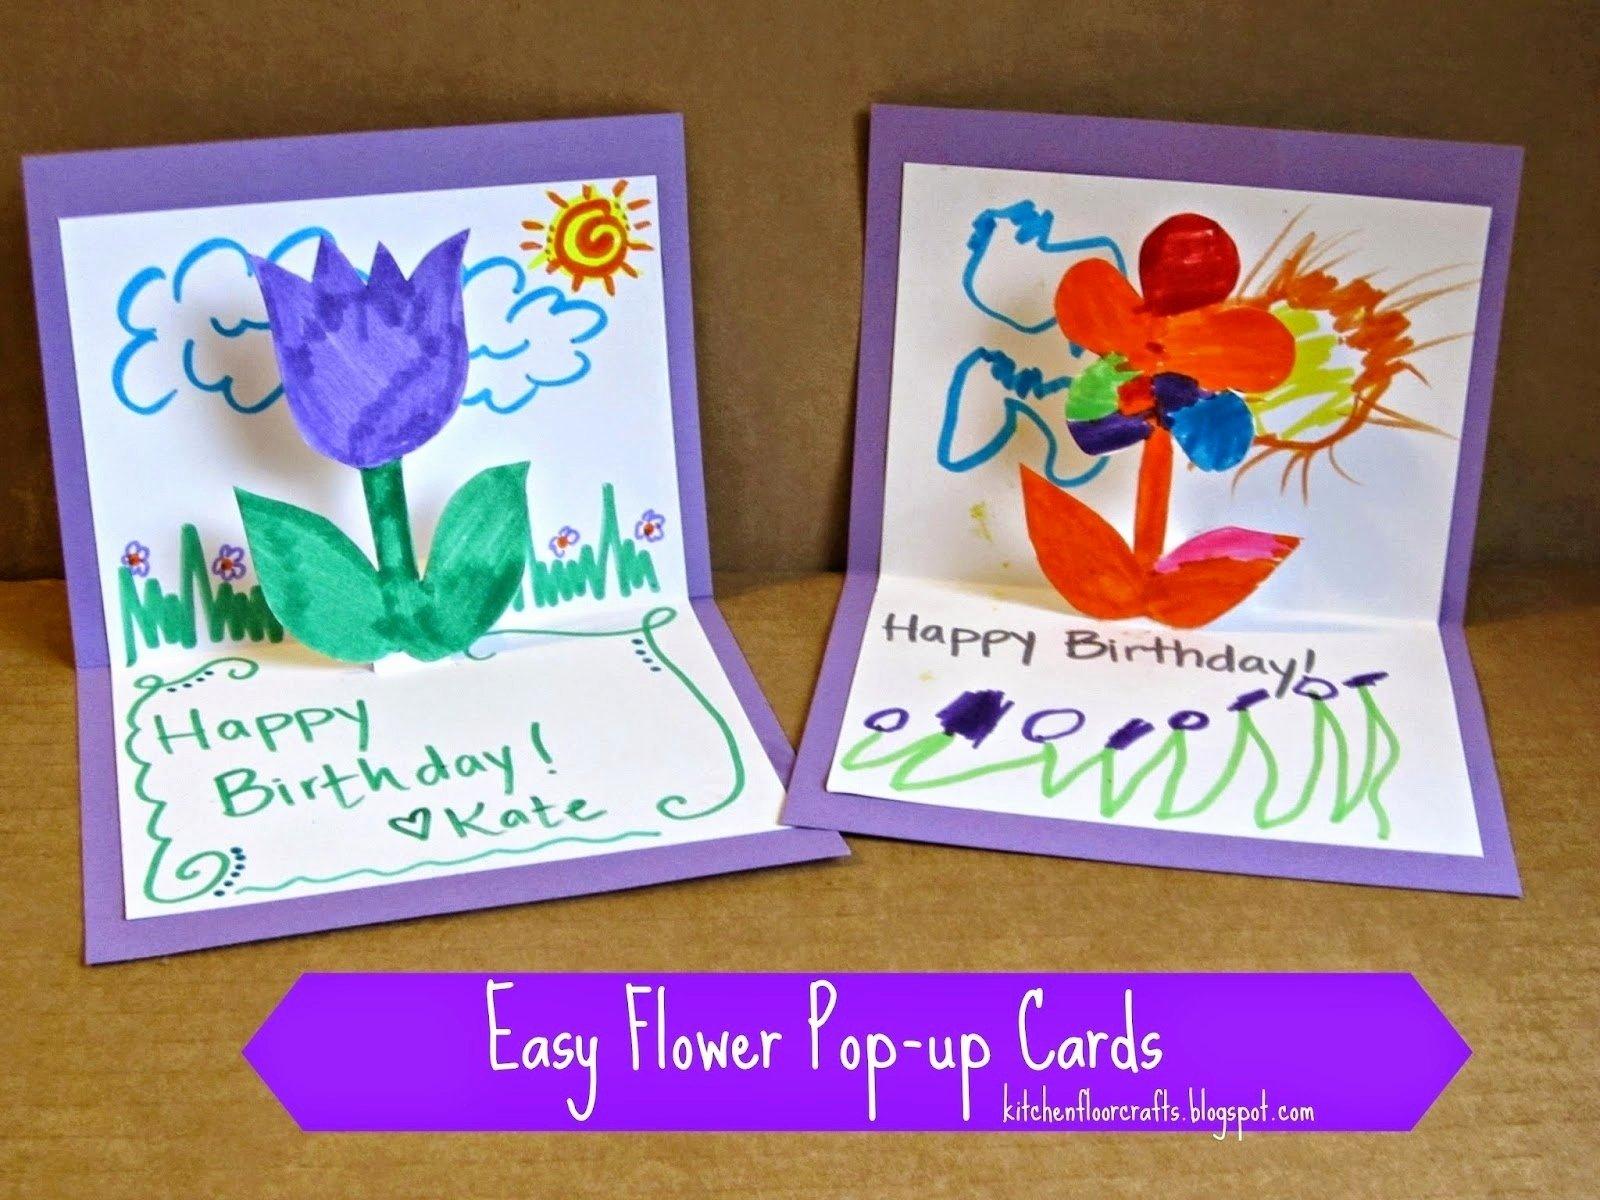 10 Unique Ideas For Handmade Birthday Cards creative handmade birthday card ideas awesome birthday cards ideas 2021